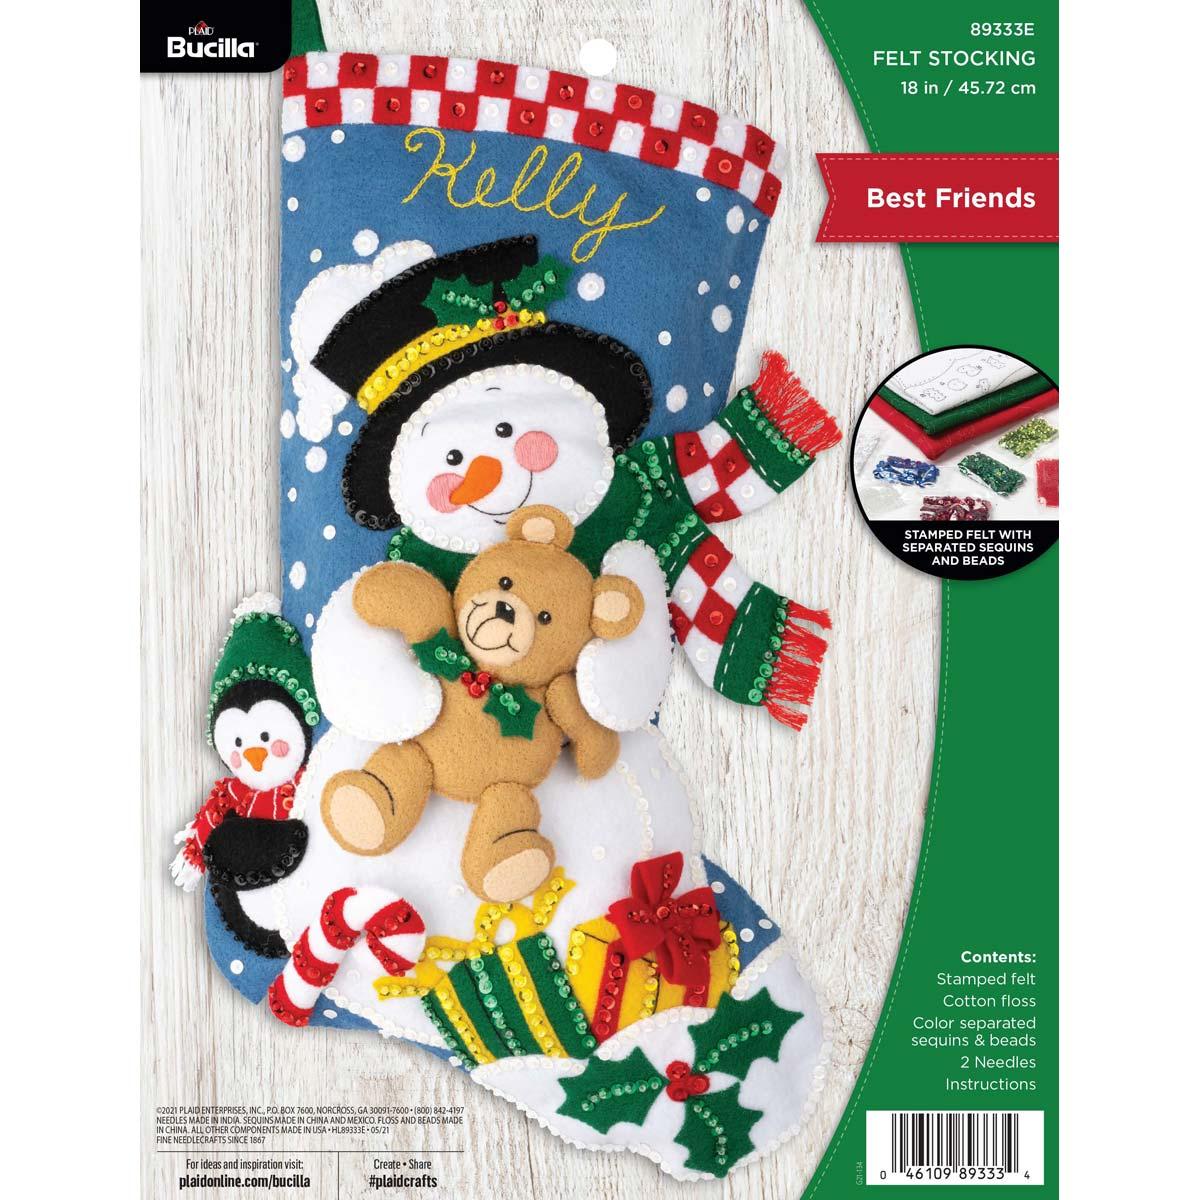 Bucilla ® Seasonal - Felt - Stocking Kits - Best Friends - 89333E